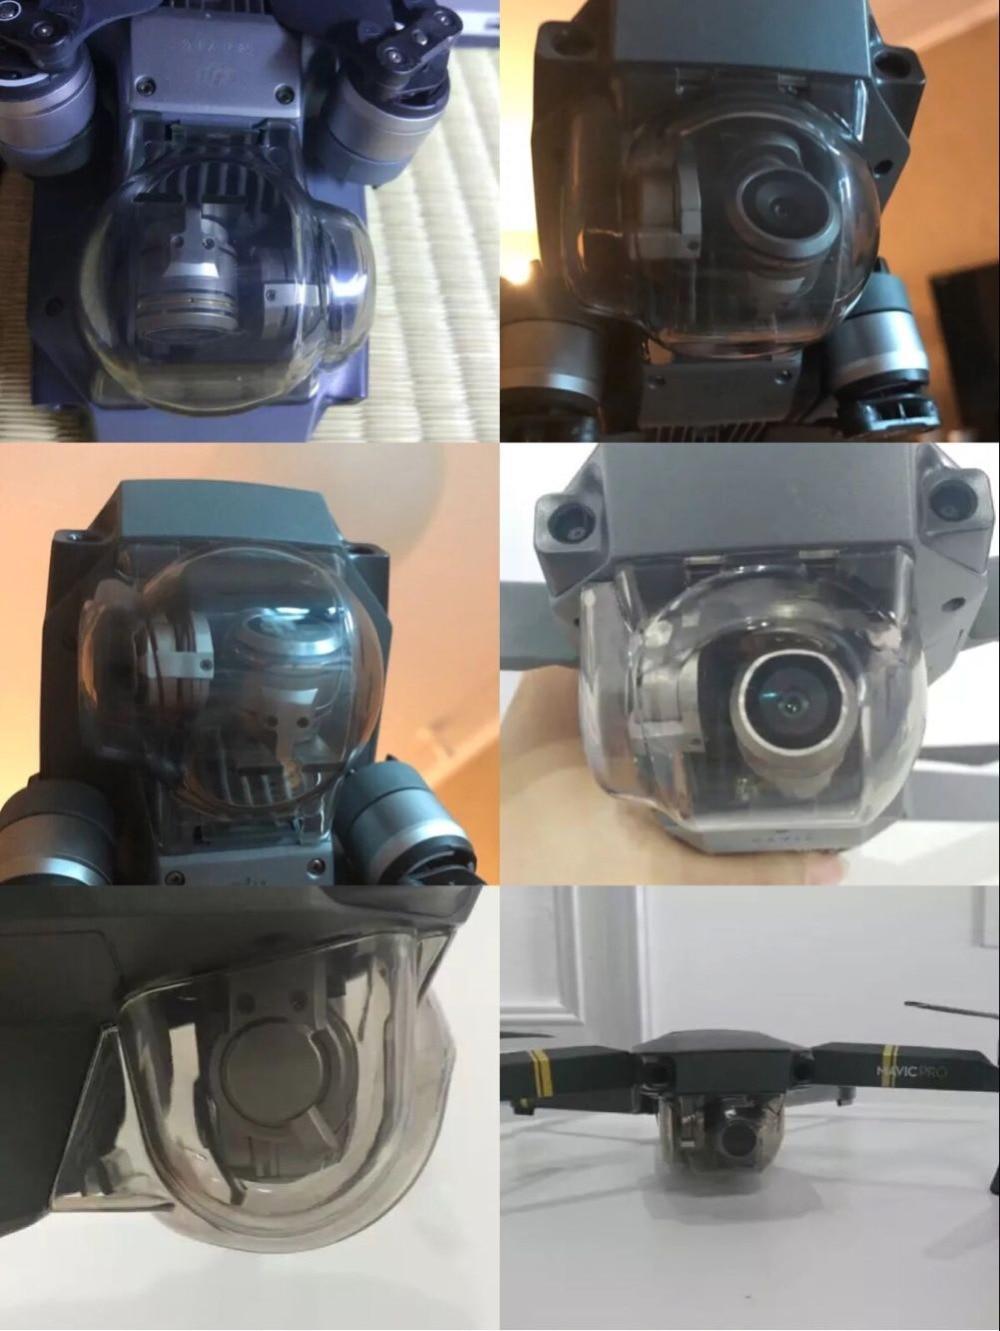 Best Price! Gimbal Camera Protective Cover Lens Cap for DJI MAVIC PRO/platinum Gimbal Lock Guard  for DJI MAVIC PRO Drone